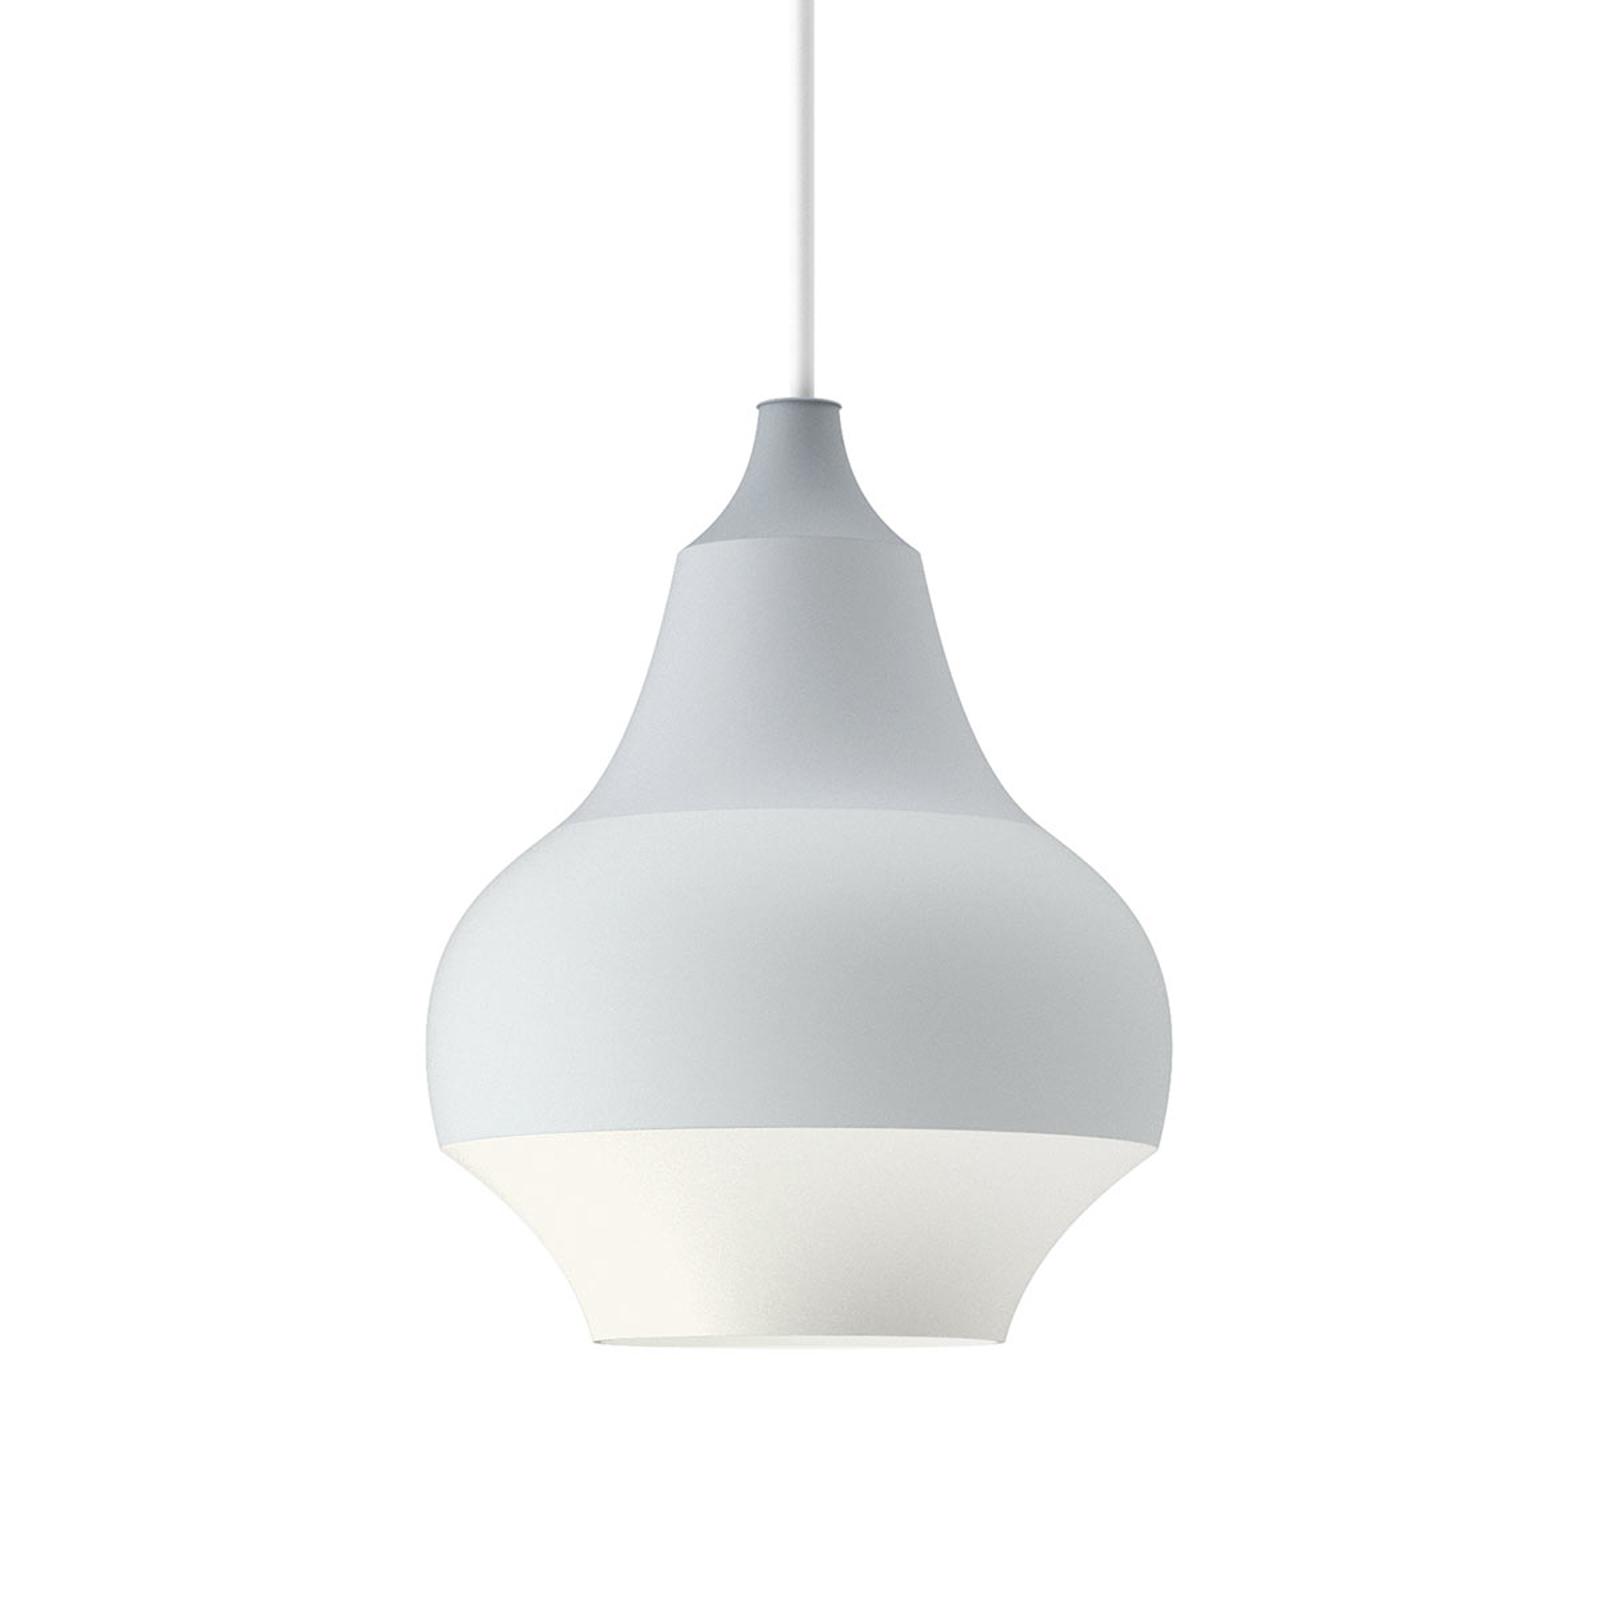 Louis Poulsen Cirque - grijze hanglamp, 15 cm